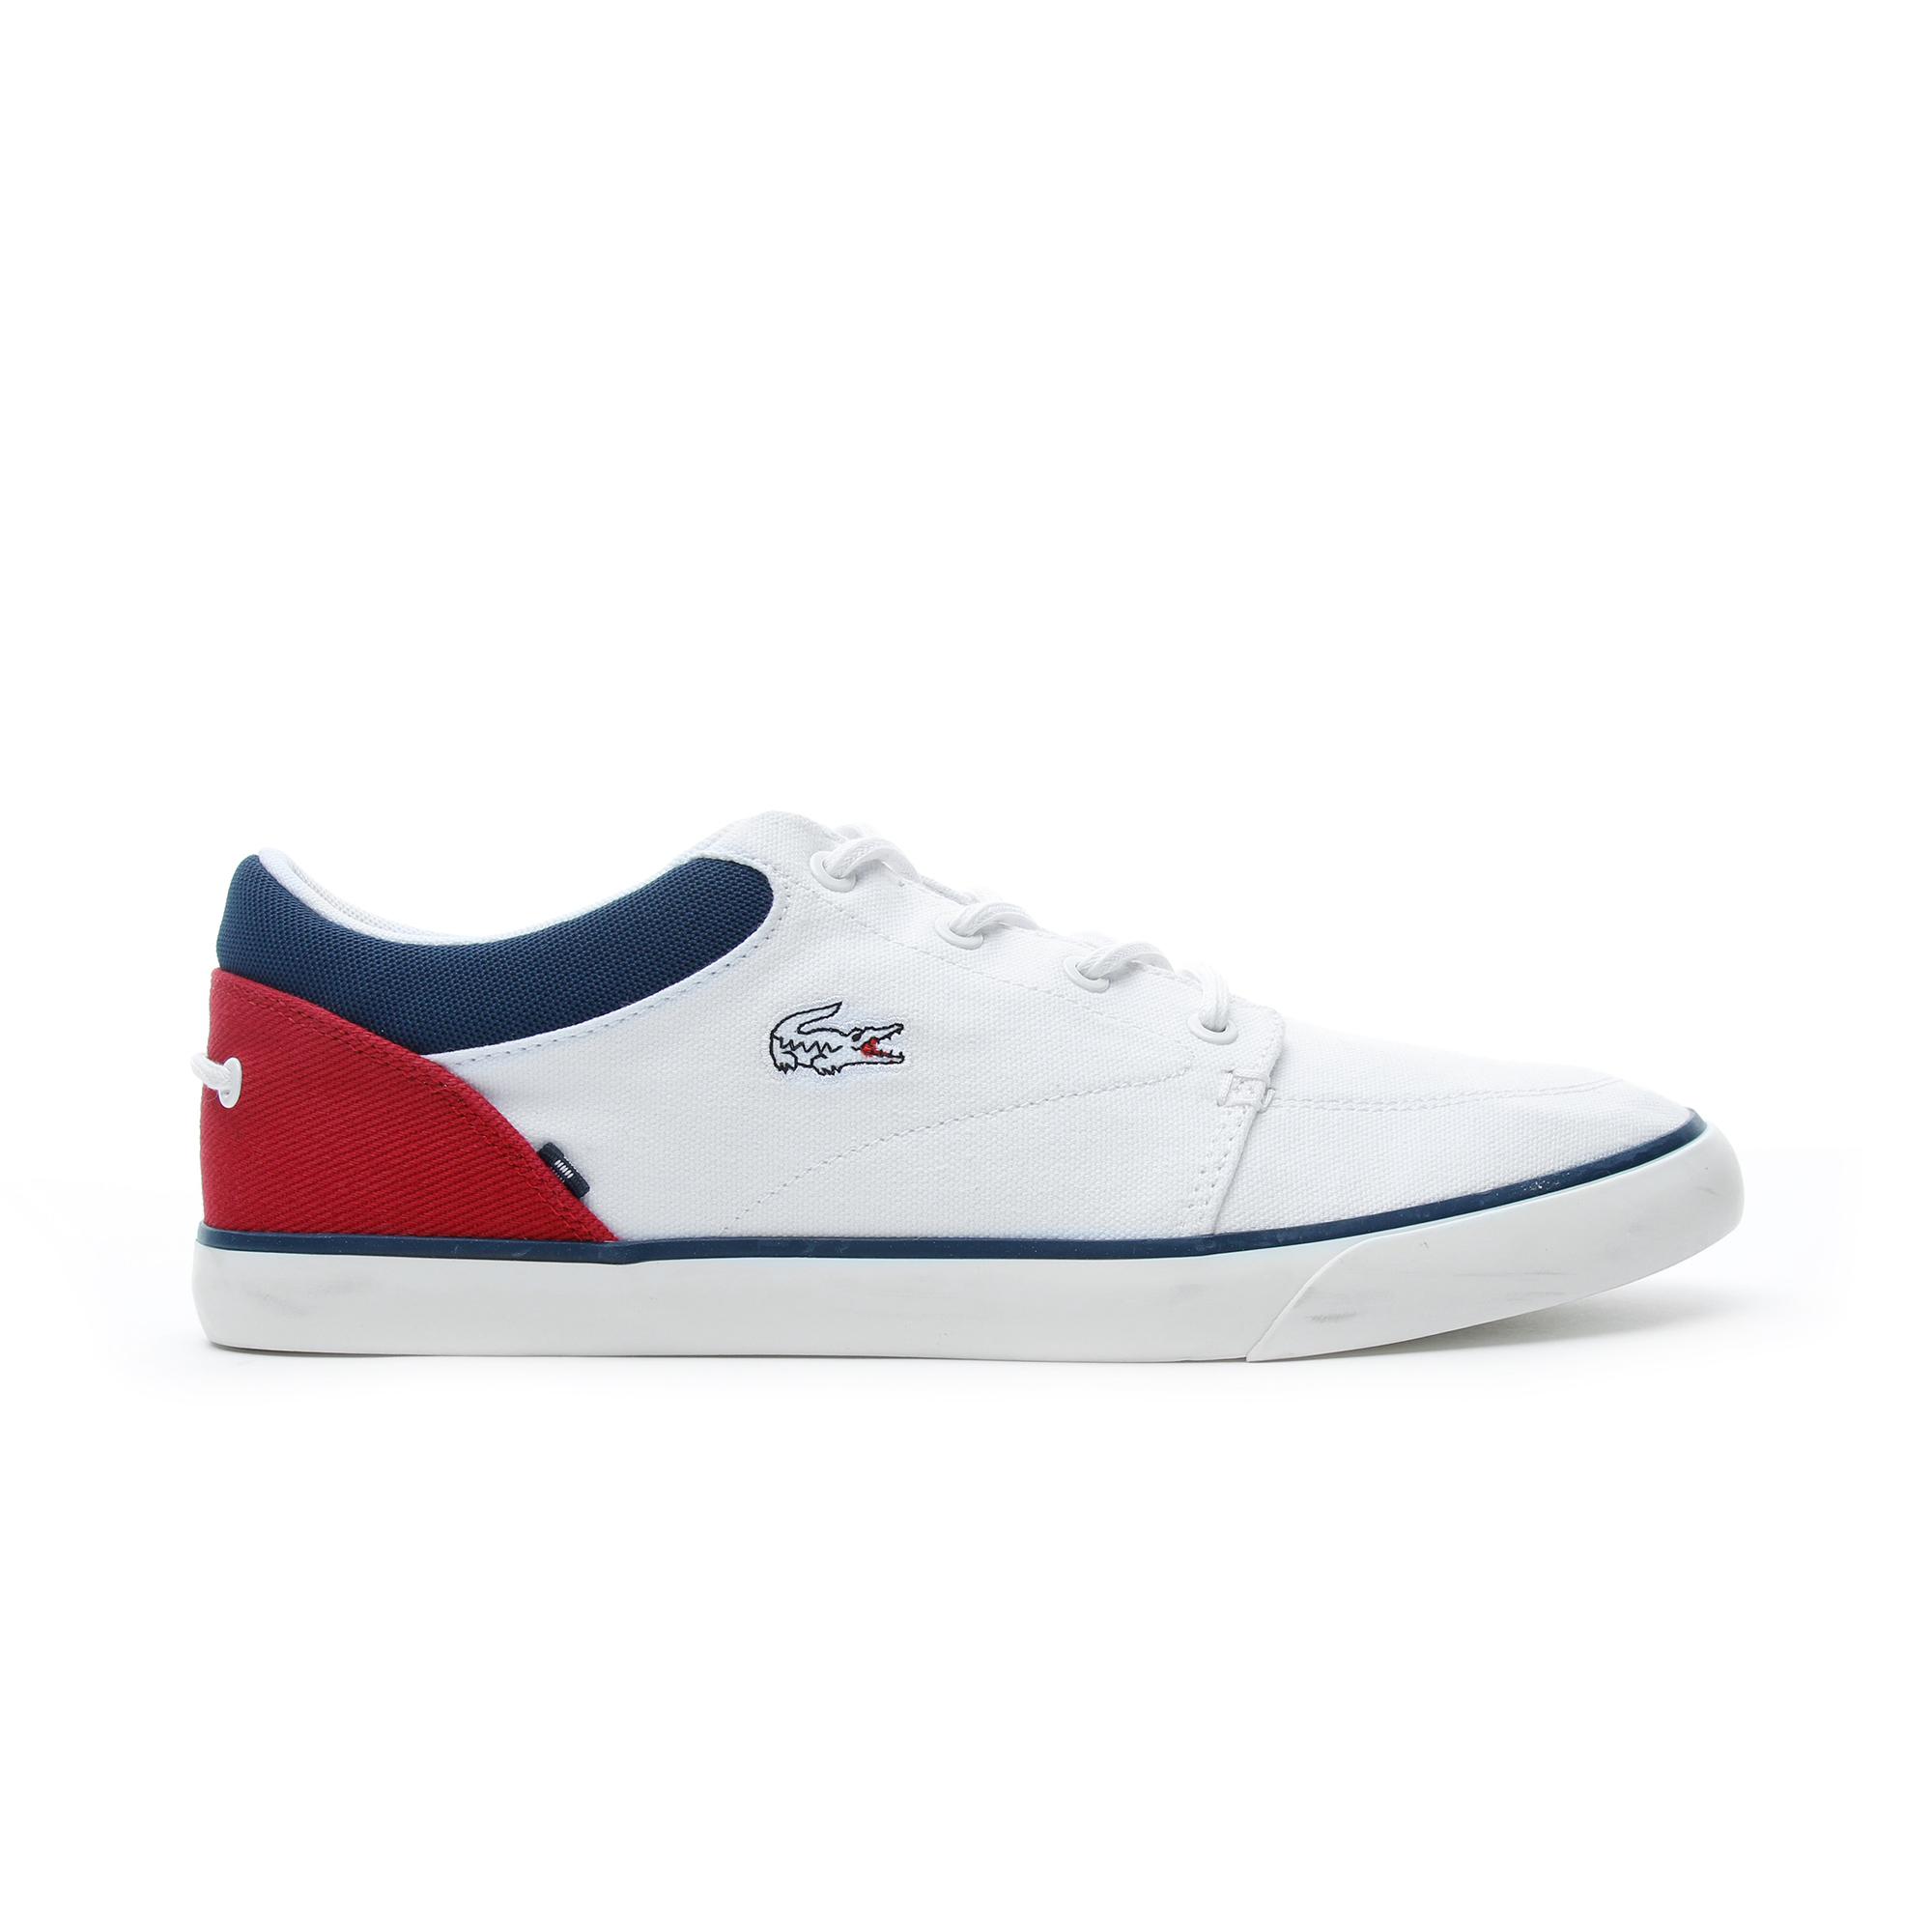 Lacoste Baylissa 220 1 Męskie Sneakersy